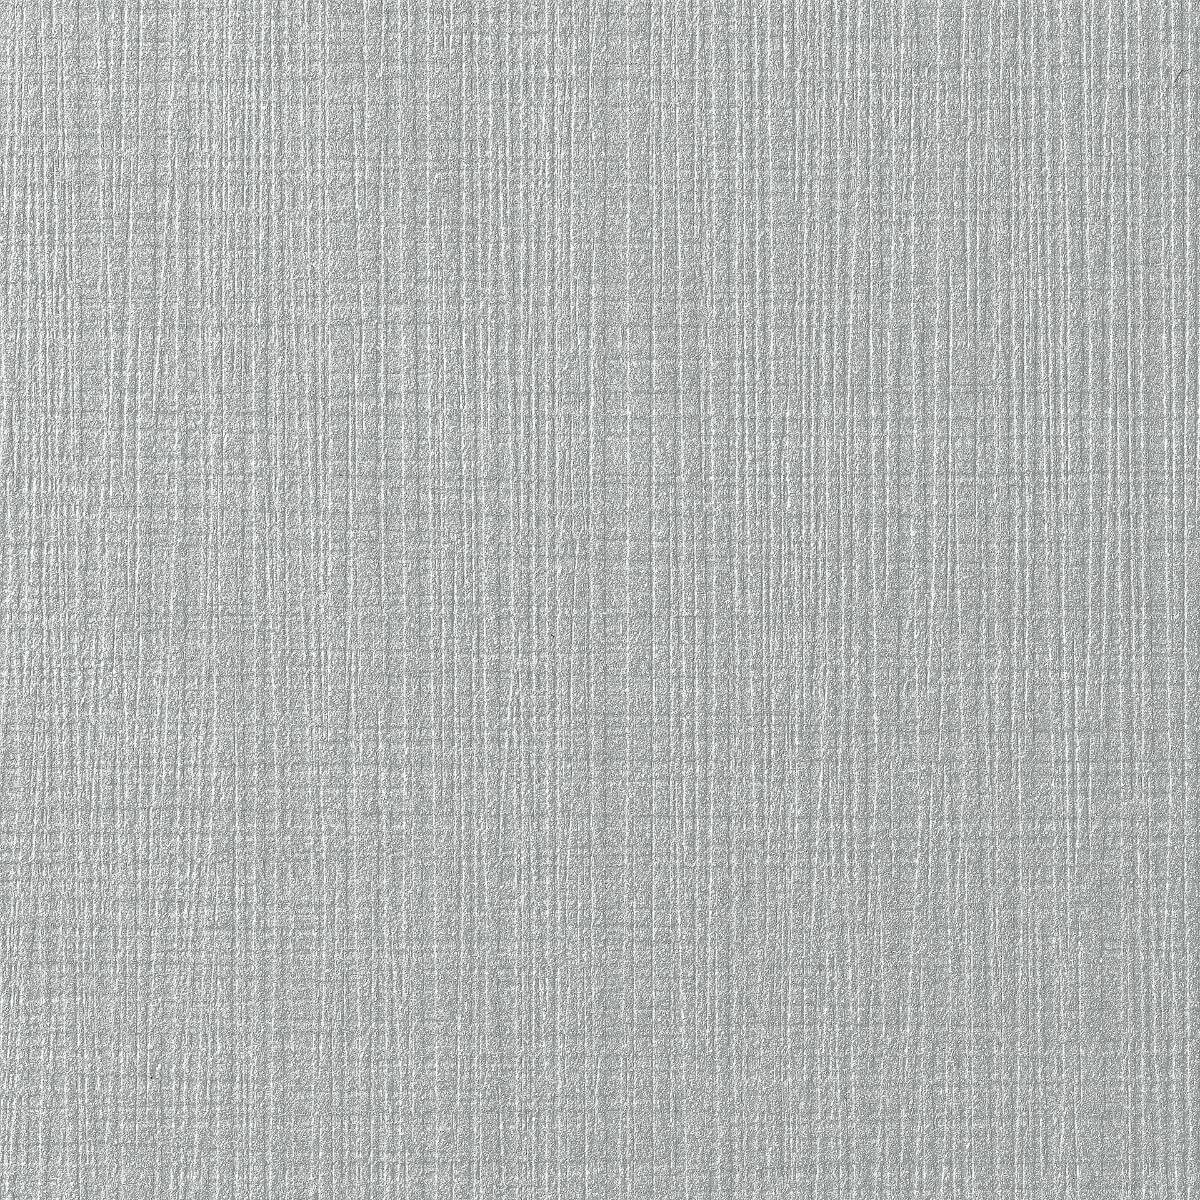 Wooden finish aluminium penelope for glass wall